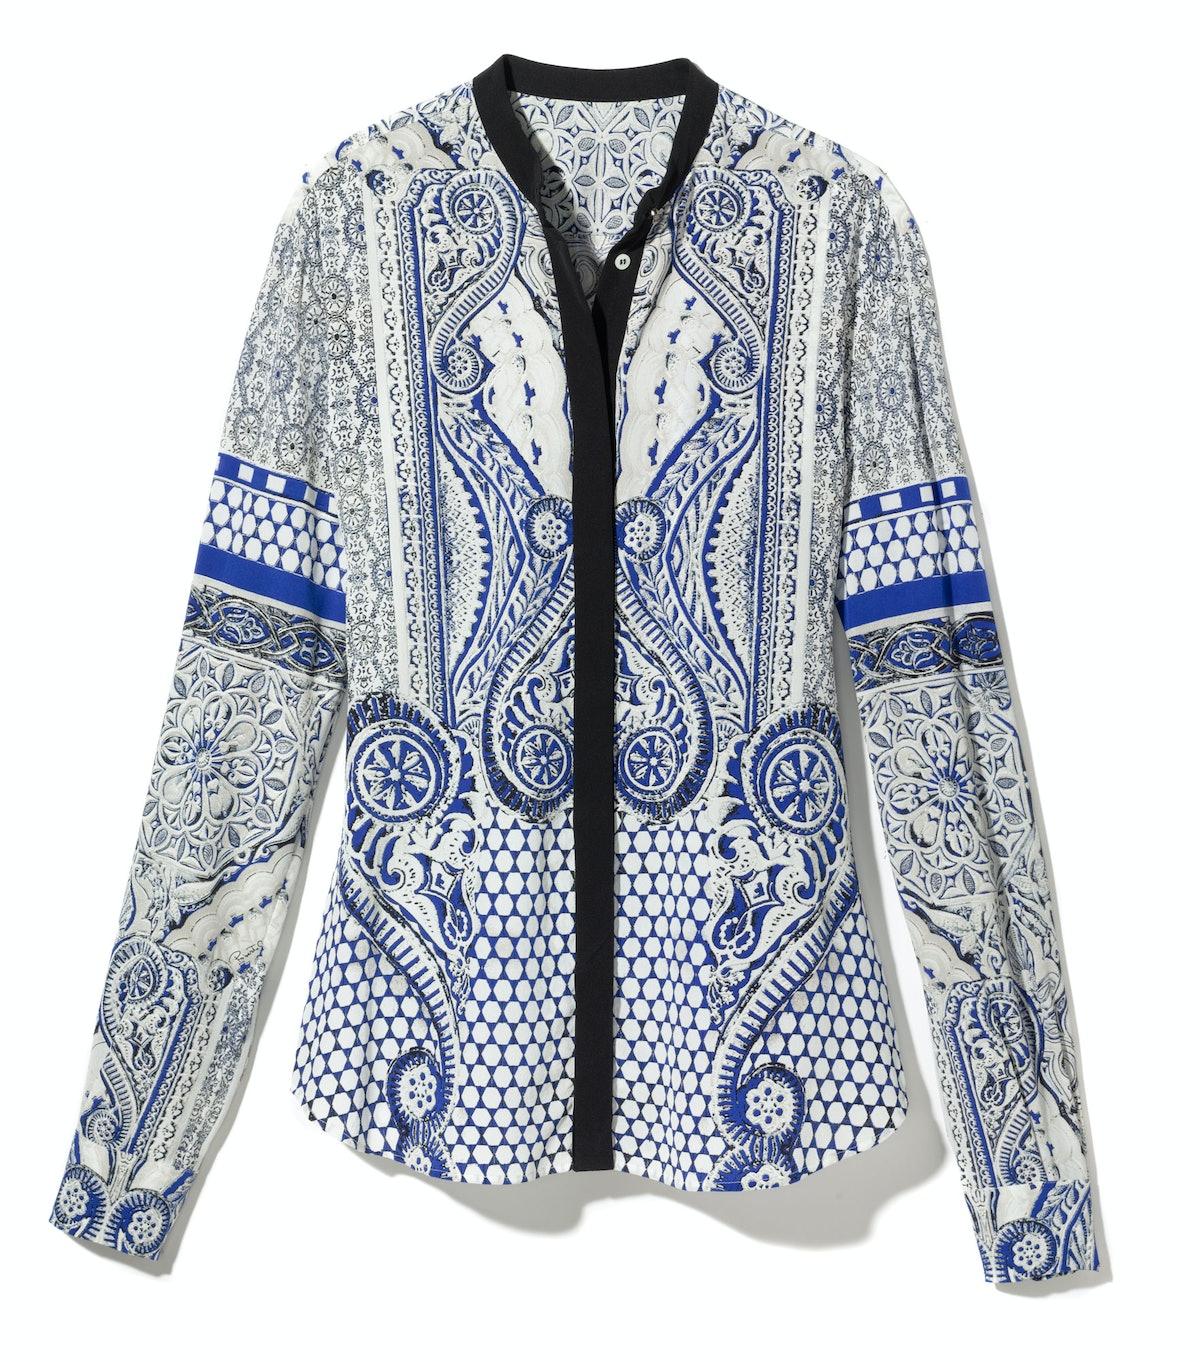 Roberto Cavalli blouse, $1,420, similar styles at robertocavalli.com.